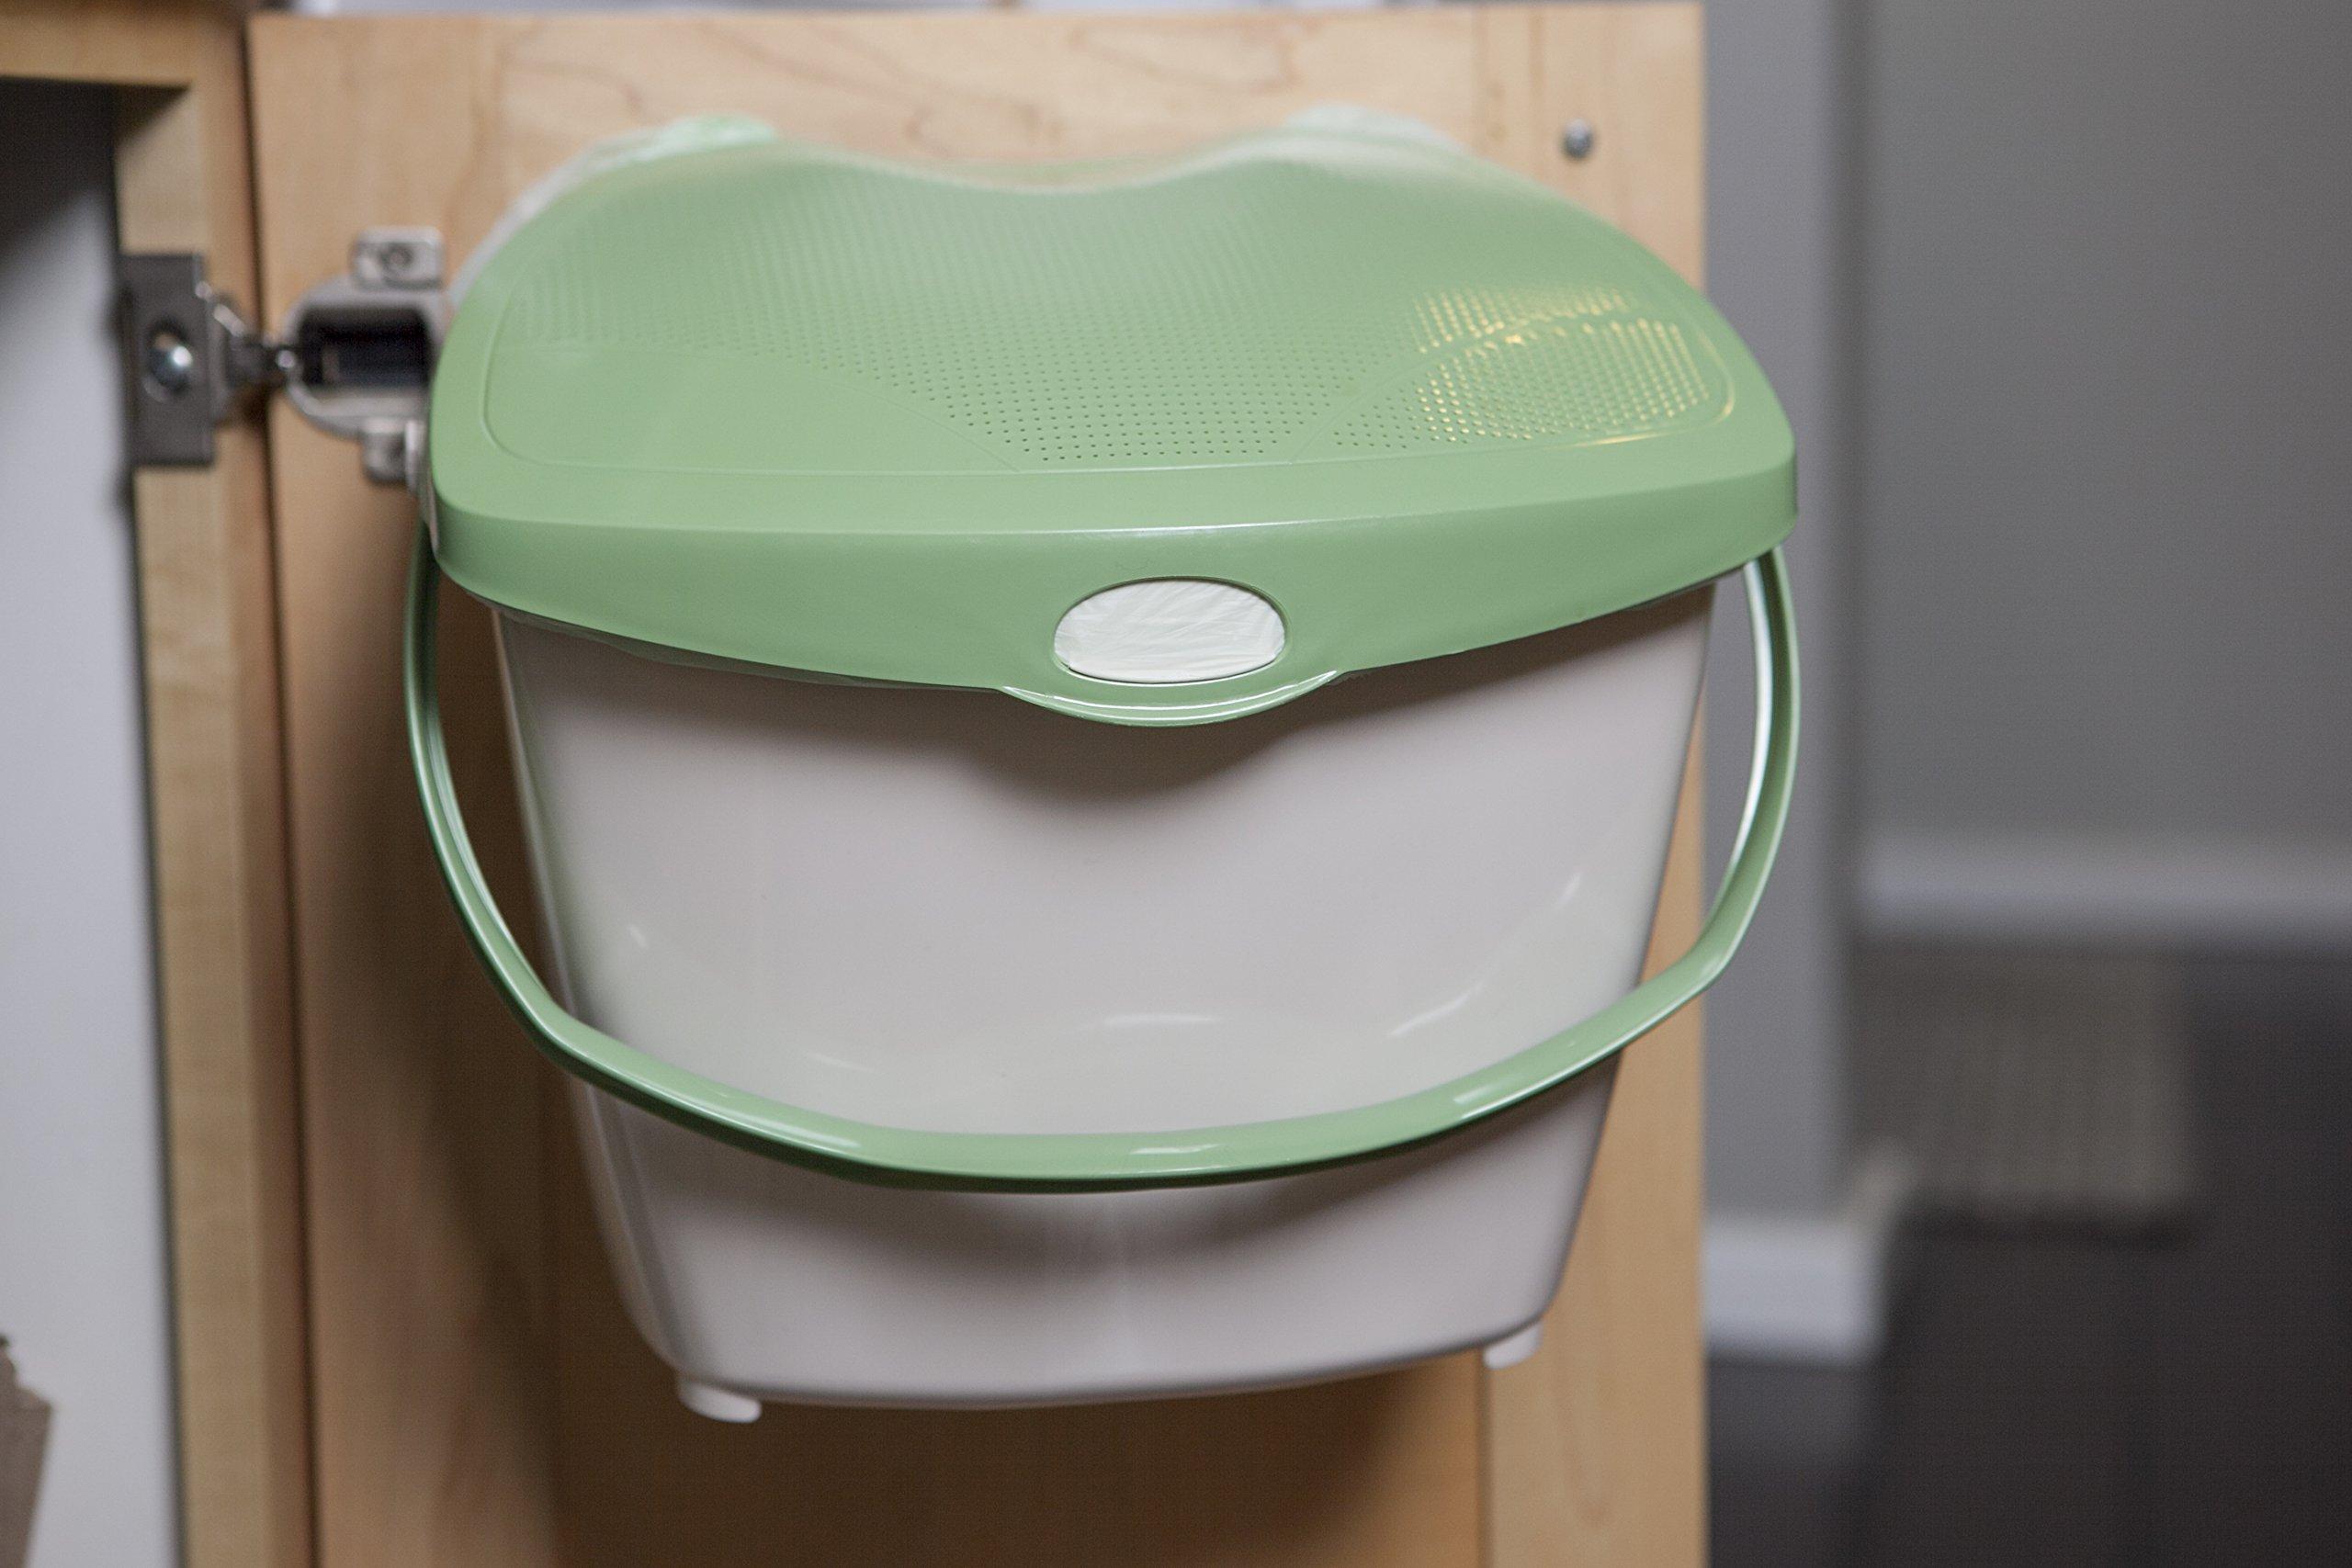 Mountable Kitchen Compost Bin